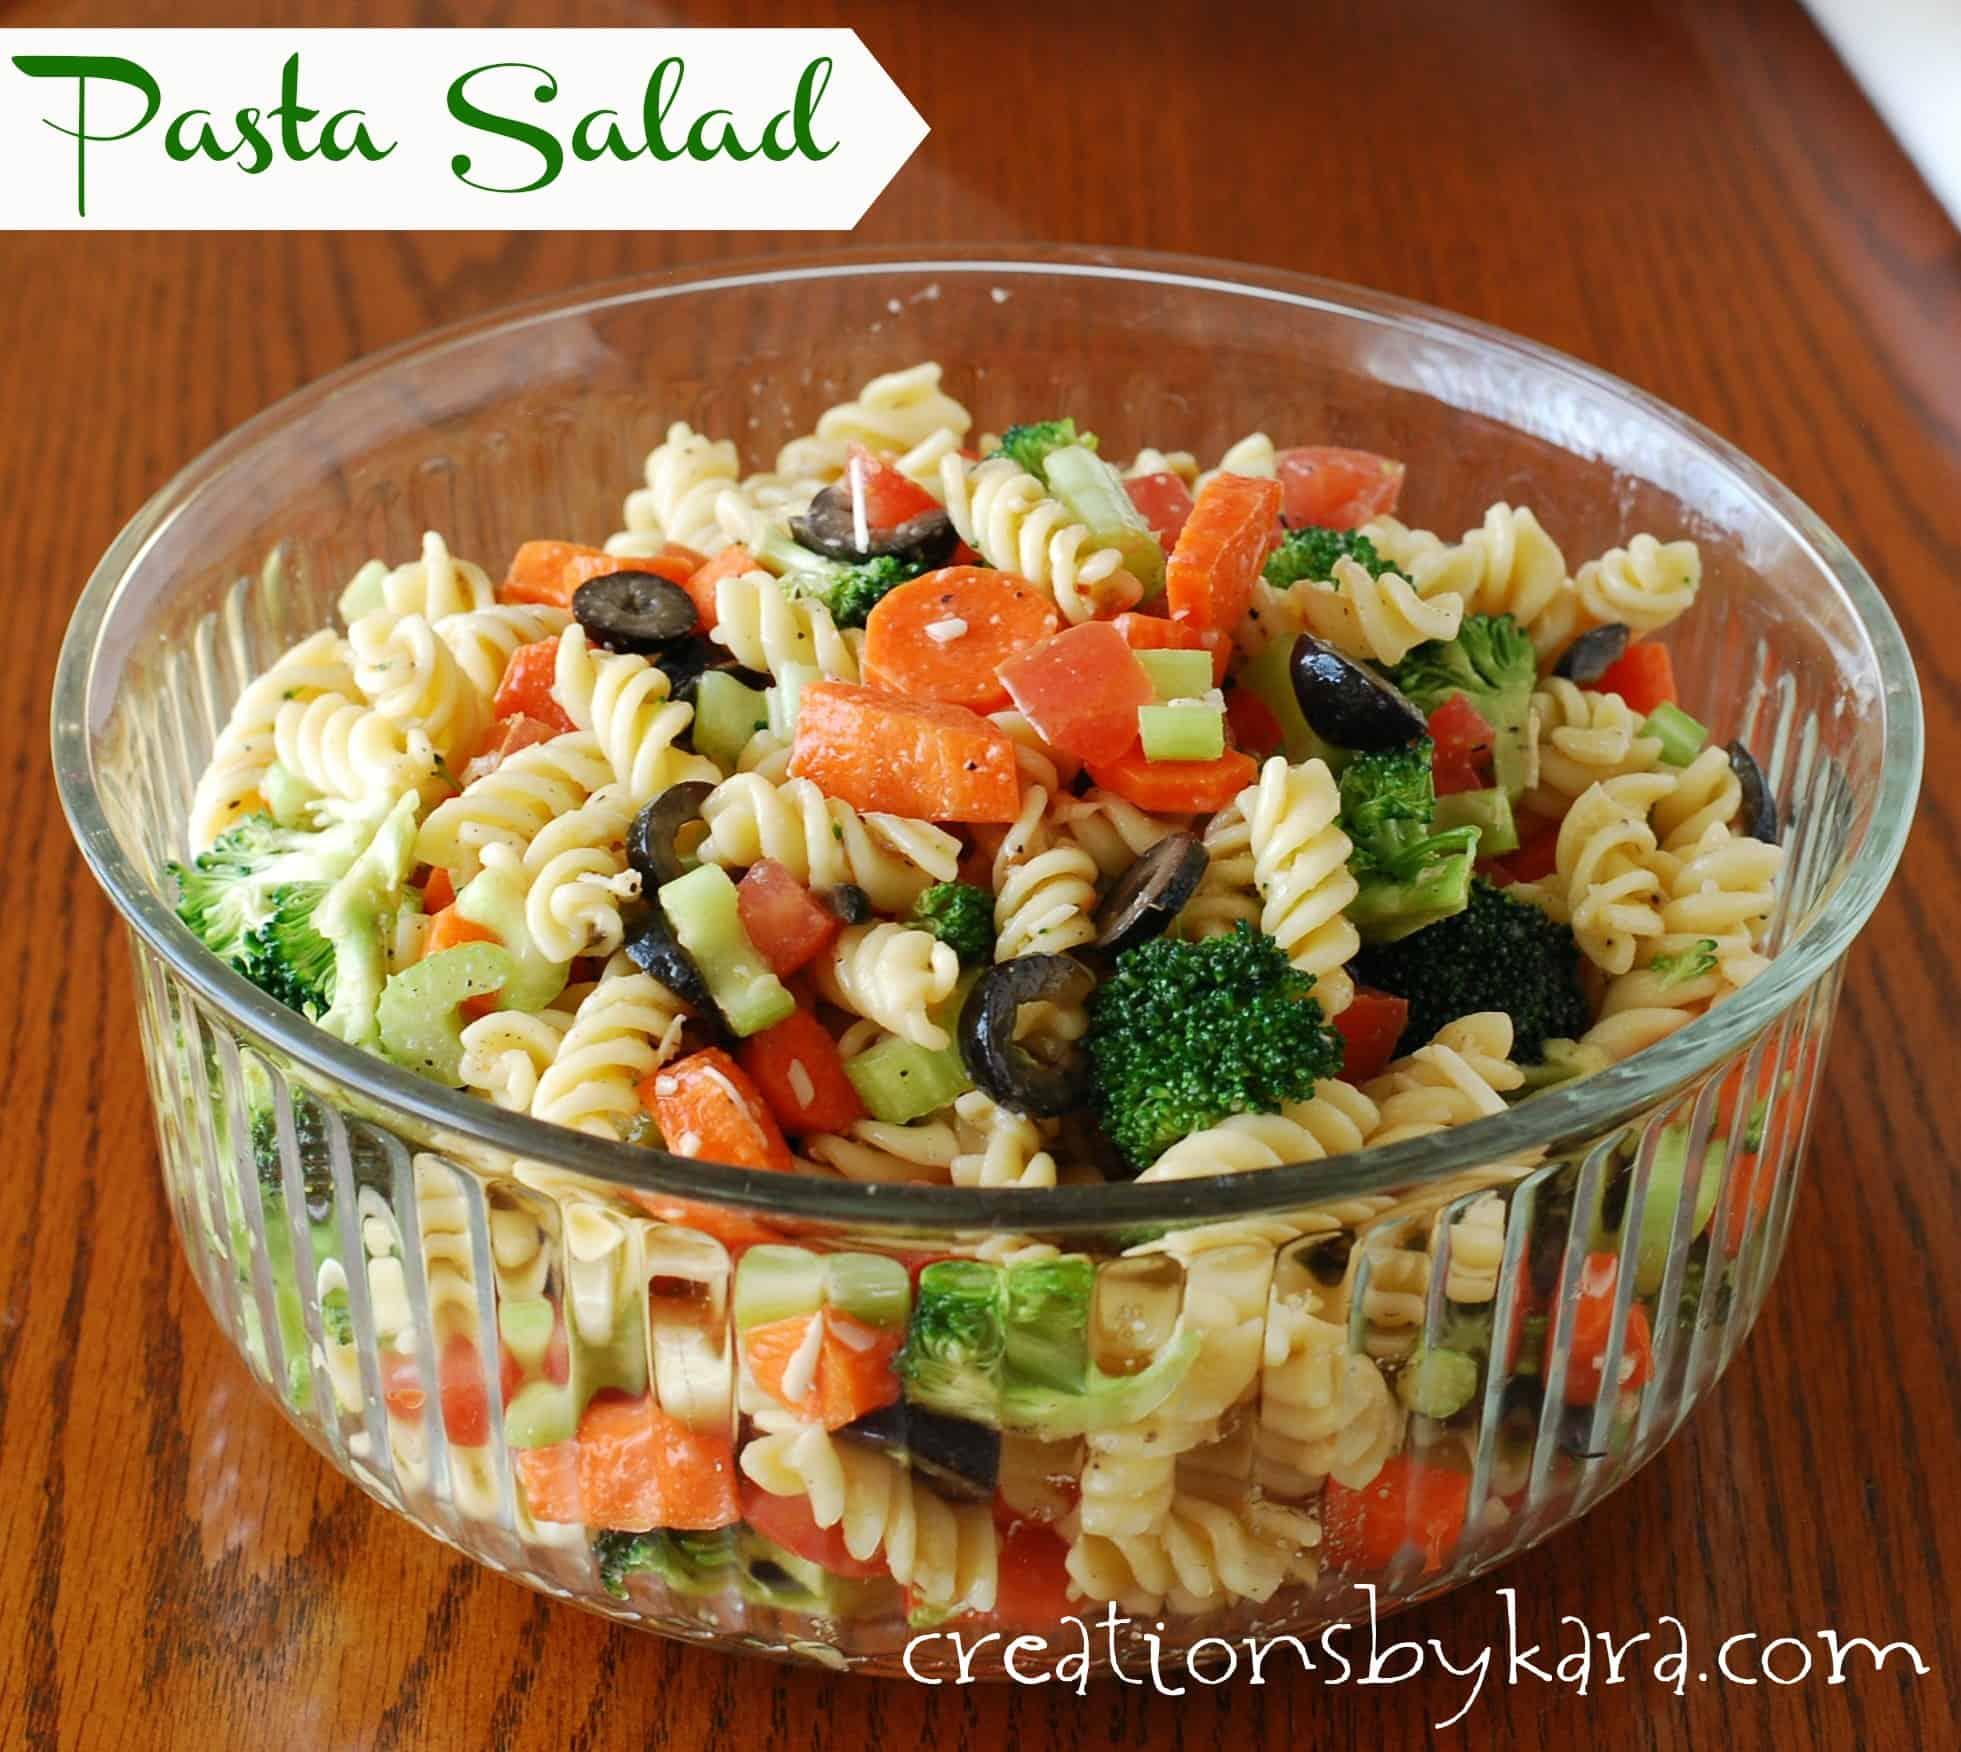 Cashew Chicken Pasta Salad A Must Try Summer Recipe